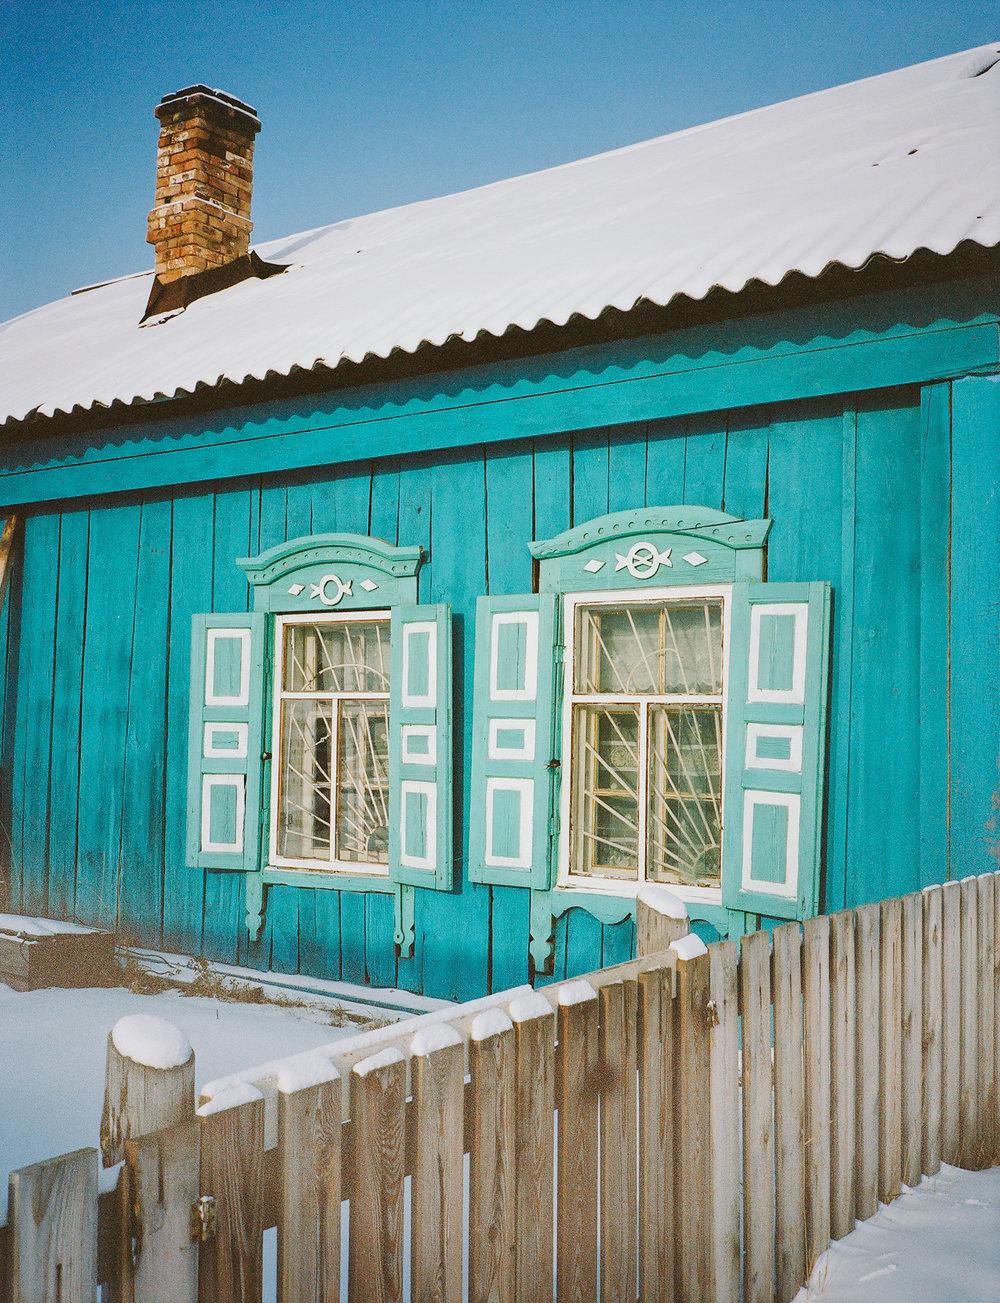 siberia_russia_12026.jpg